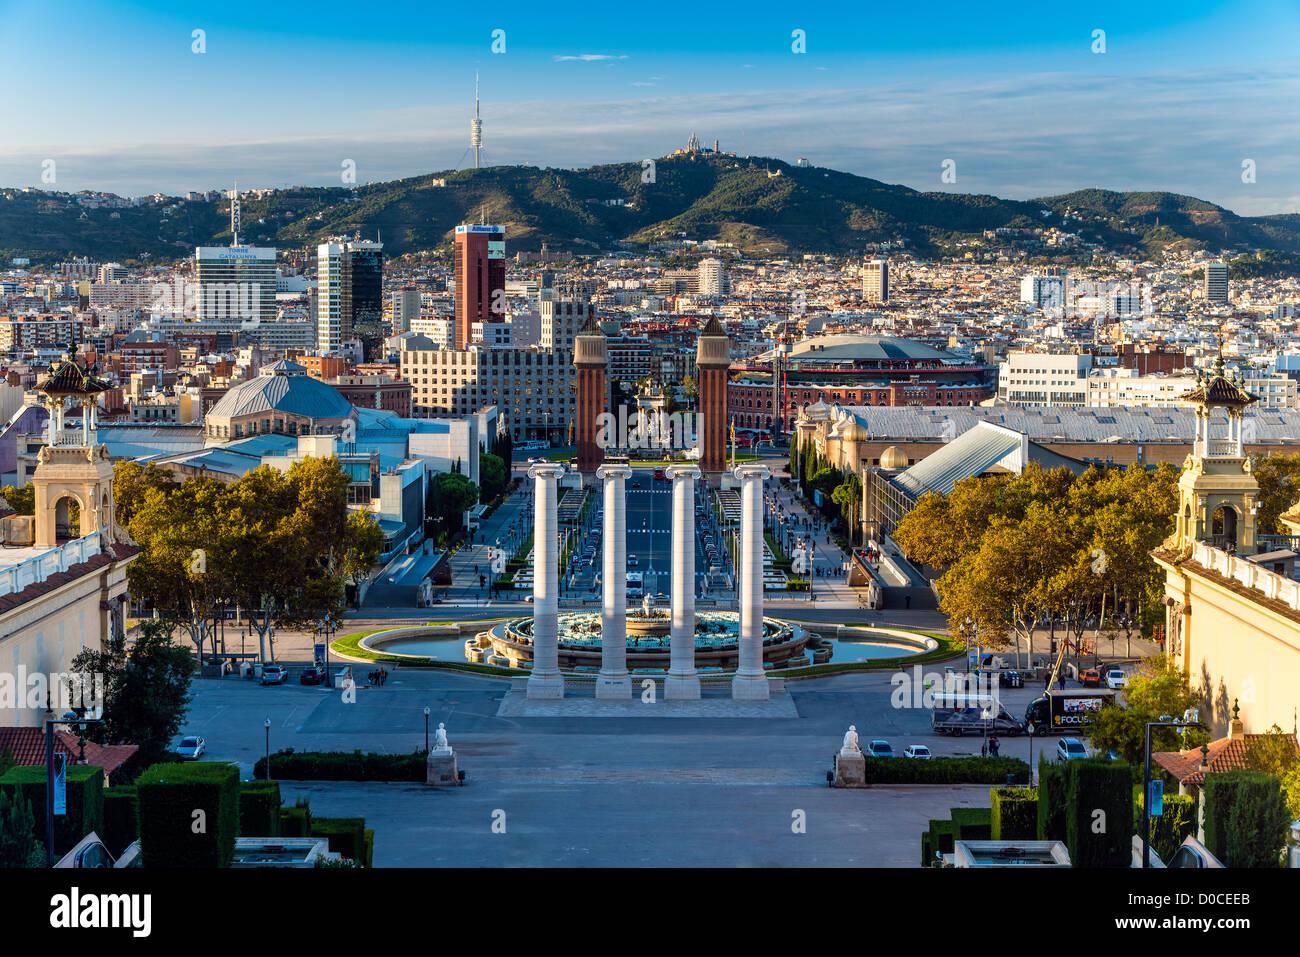 Panoramic view over Barcelona from Palau Nacional at Montjuïc, Barcelona, Catalonia, Spain - Stock Image